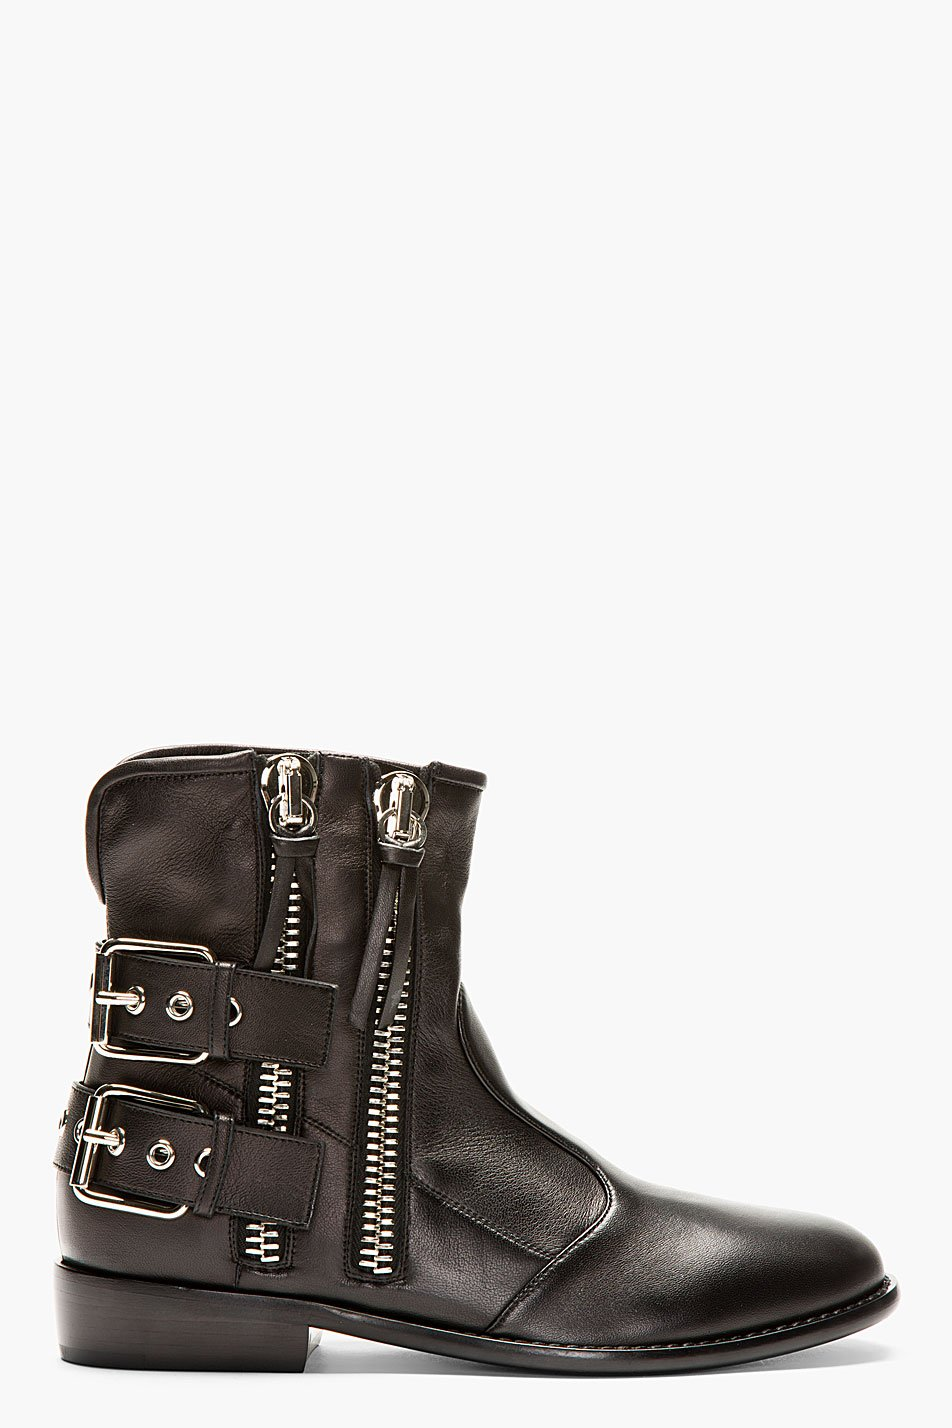 giuseppe zanotti black leather buckle boots